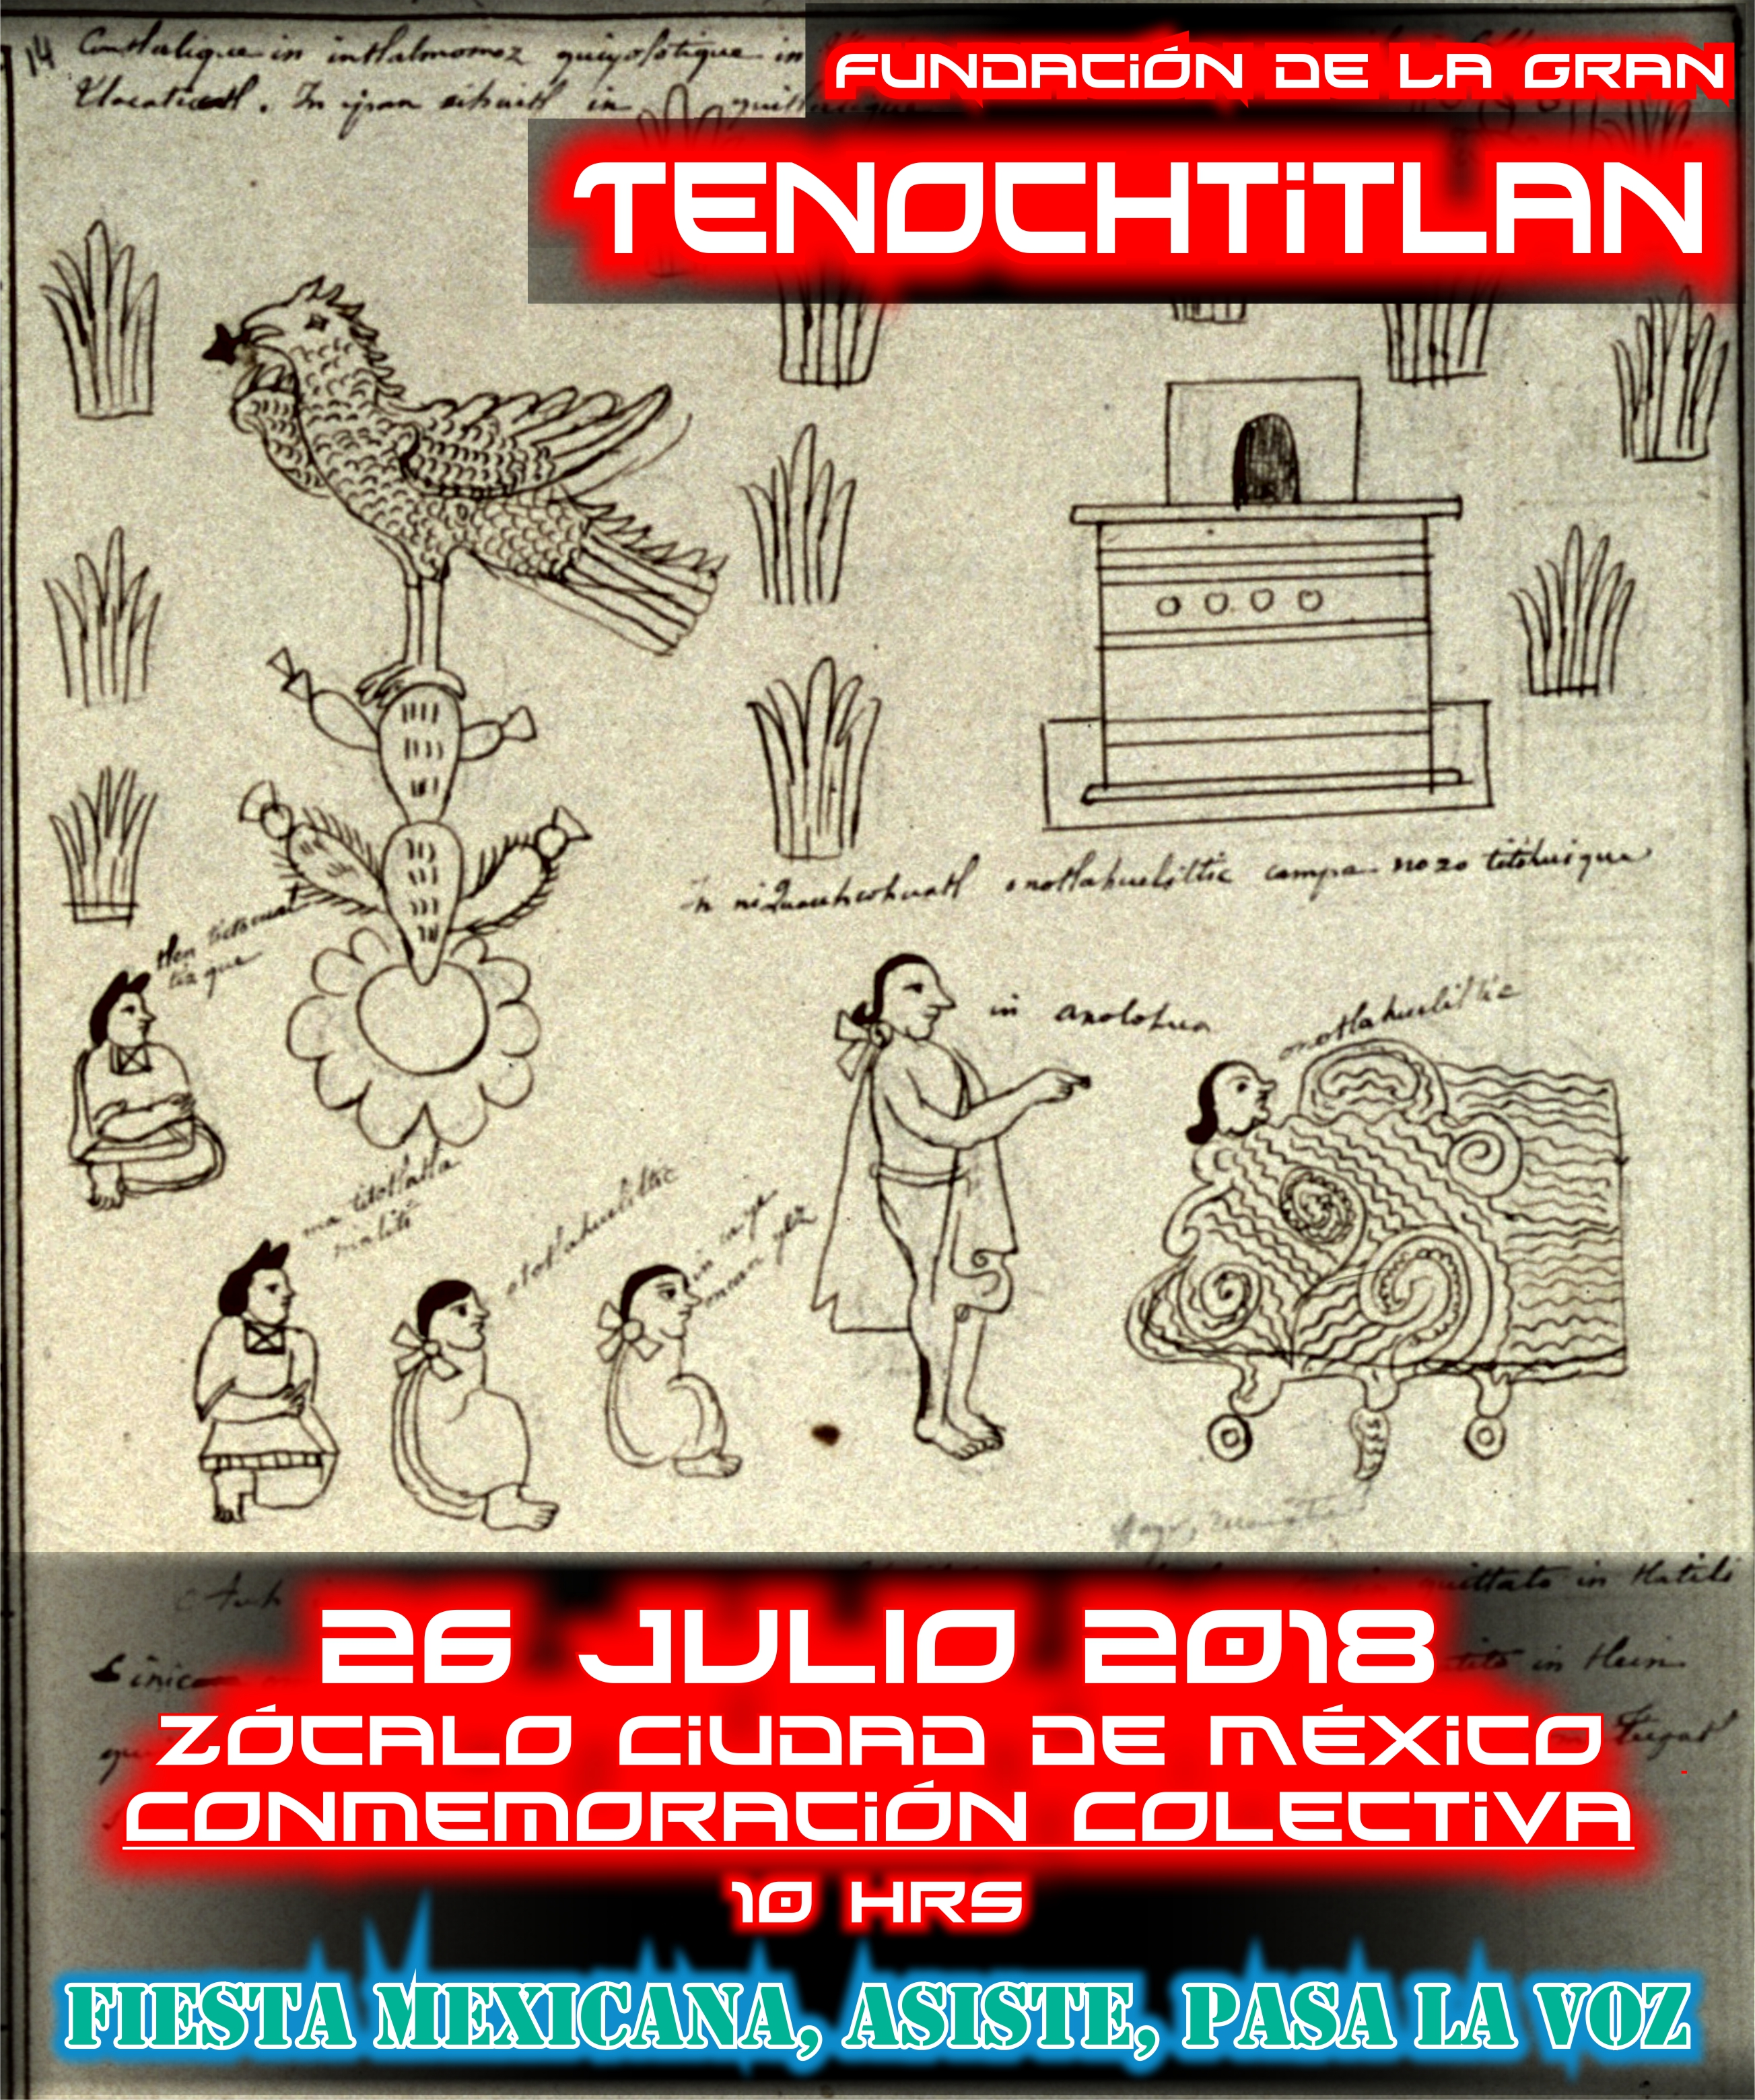 089 1 Historia Mexicana 1194 1221